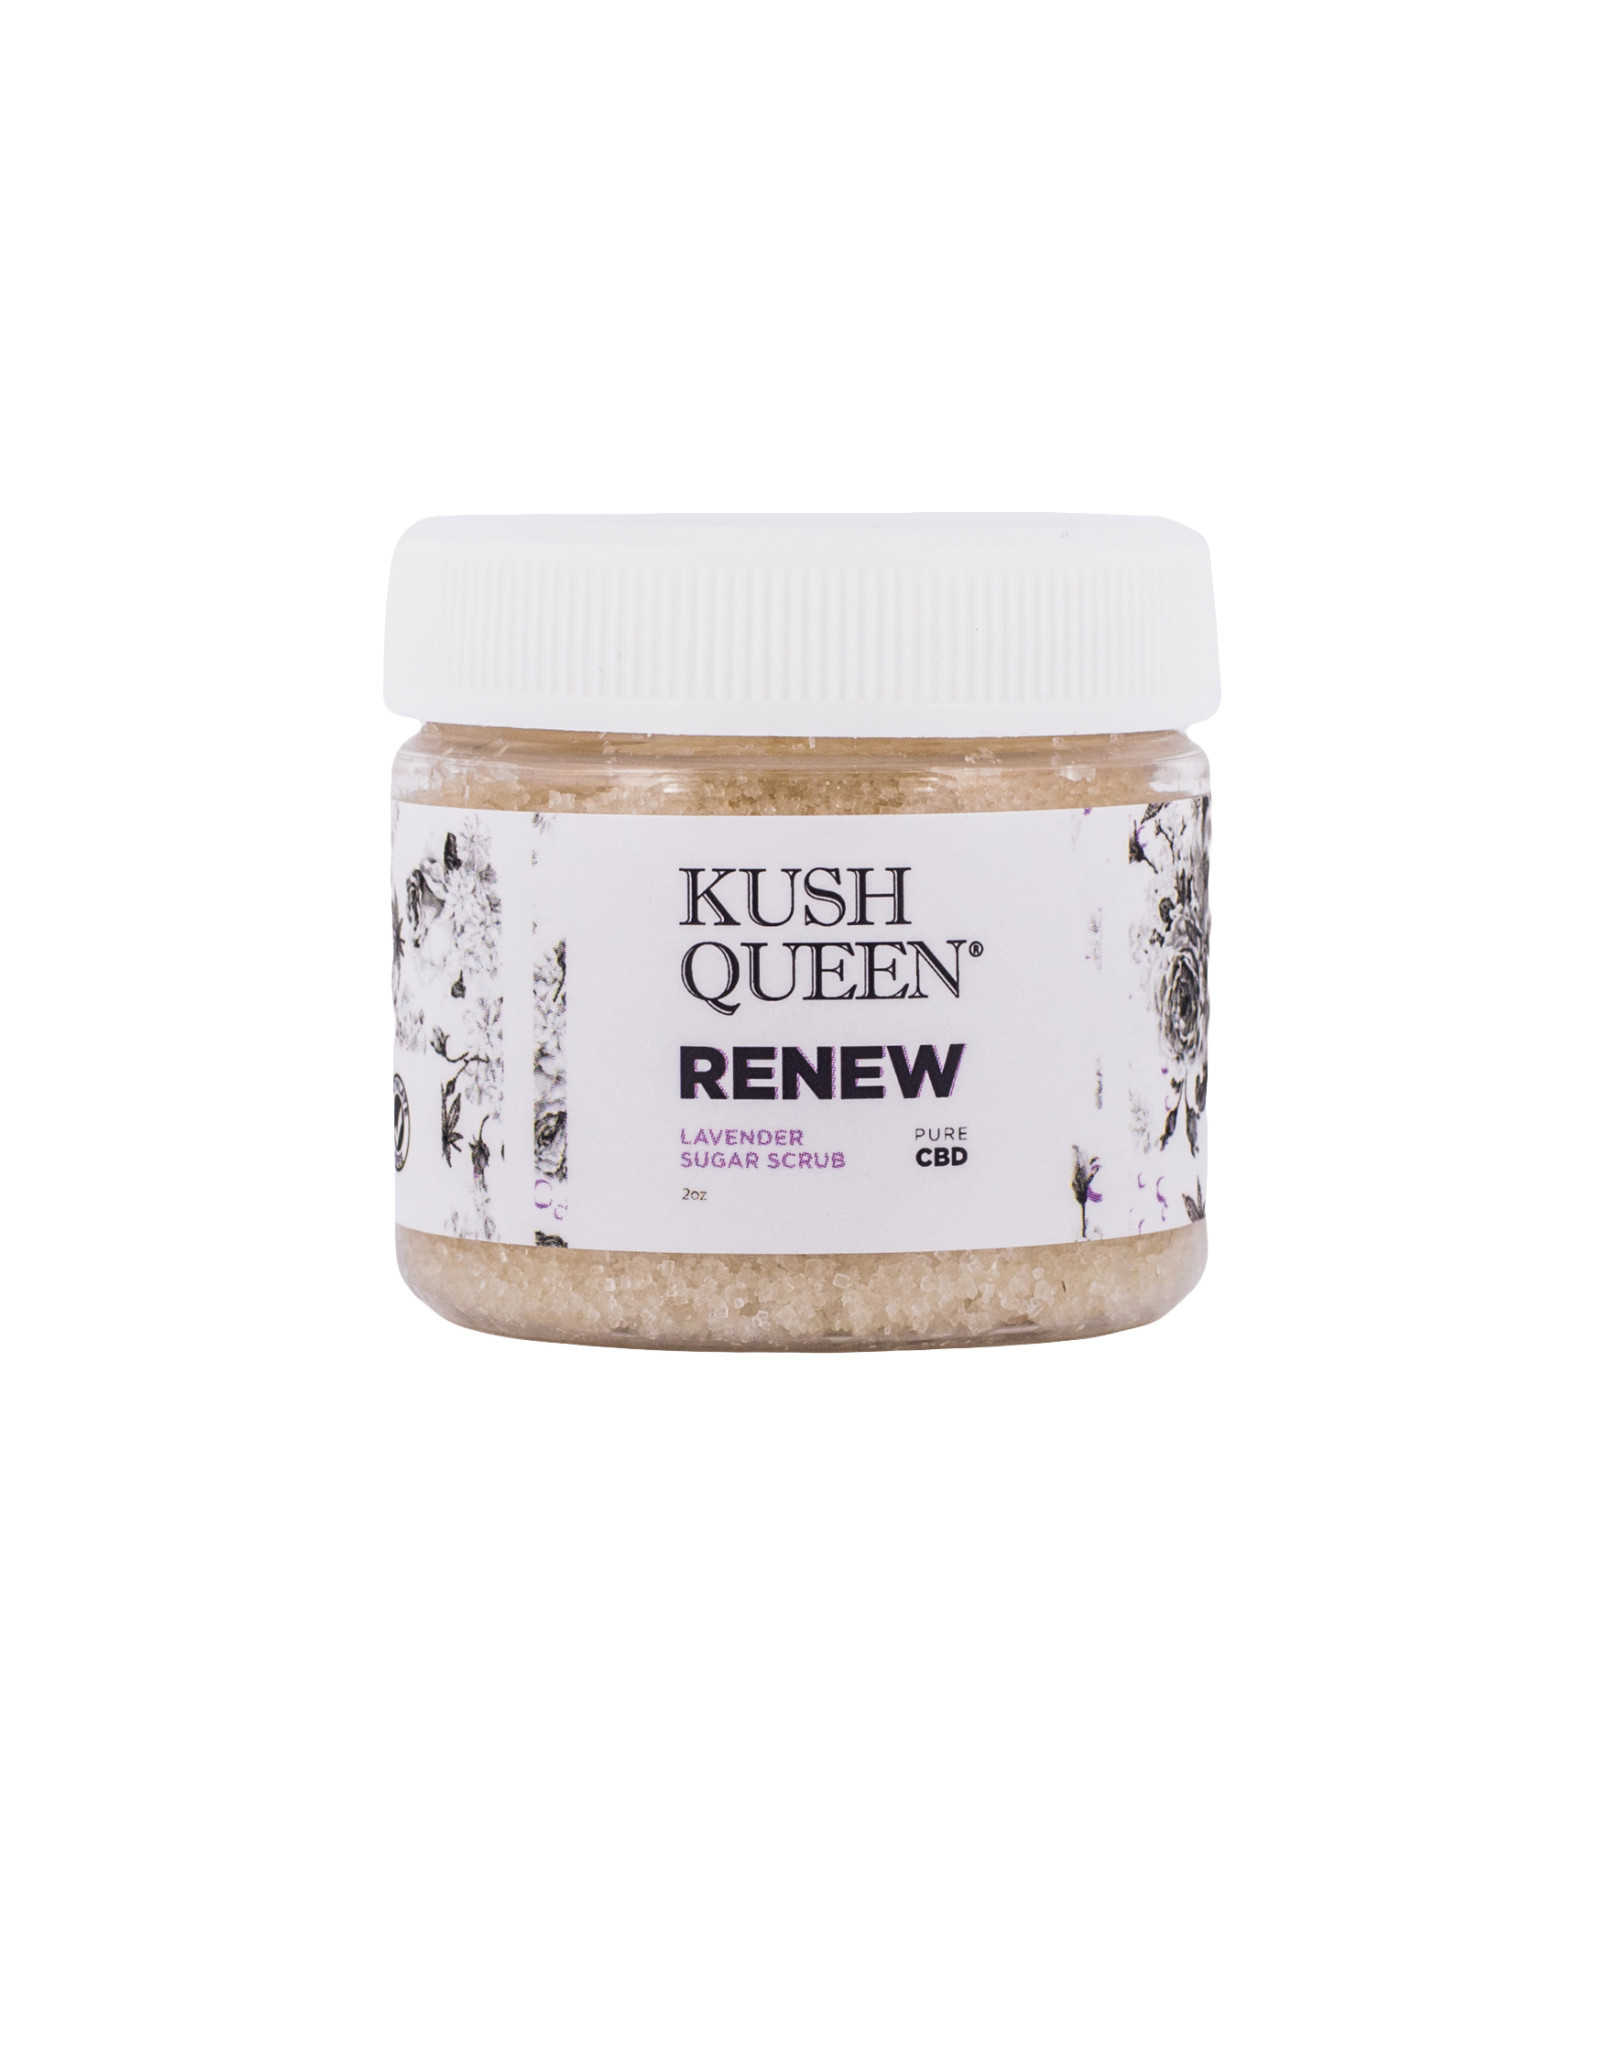 Kush Queen CBD Renew Lavender Sugar Scrub 2oz